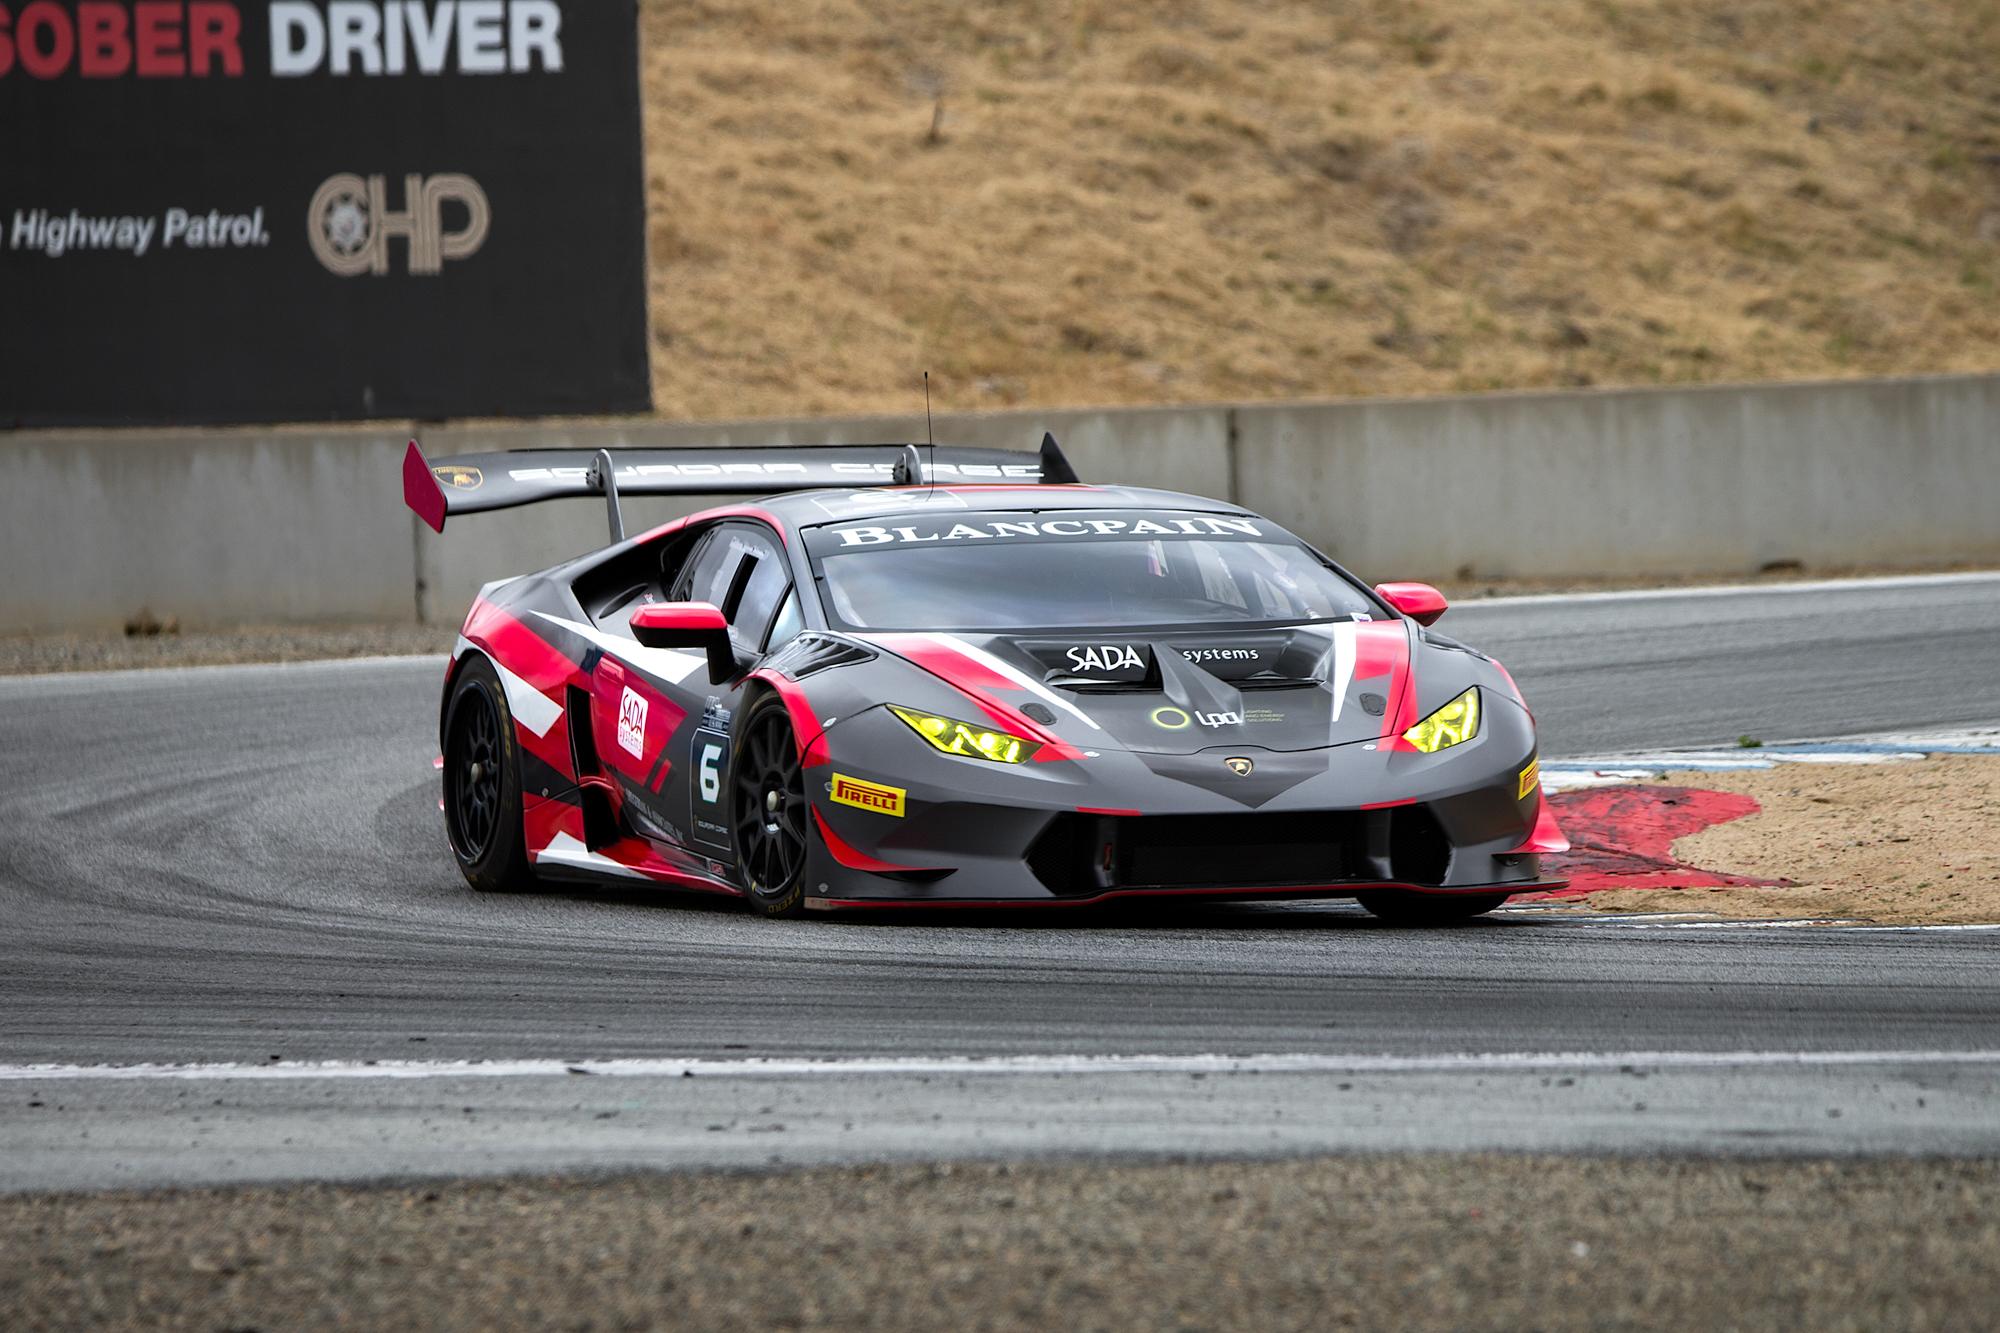 Steven-Racing-Laguna-20180531-96092.jpg